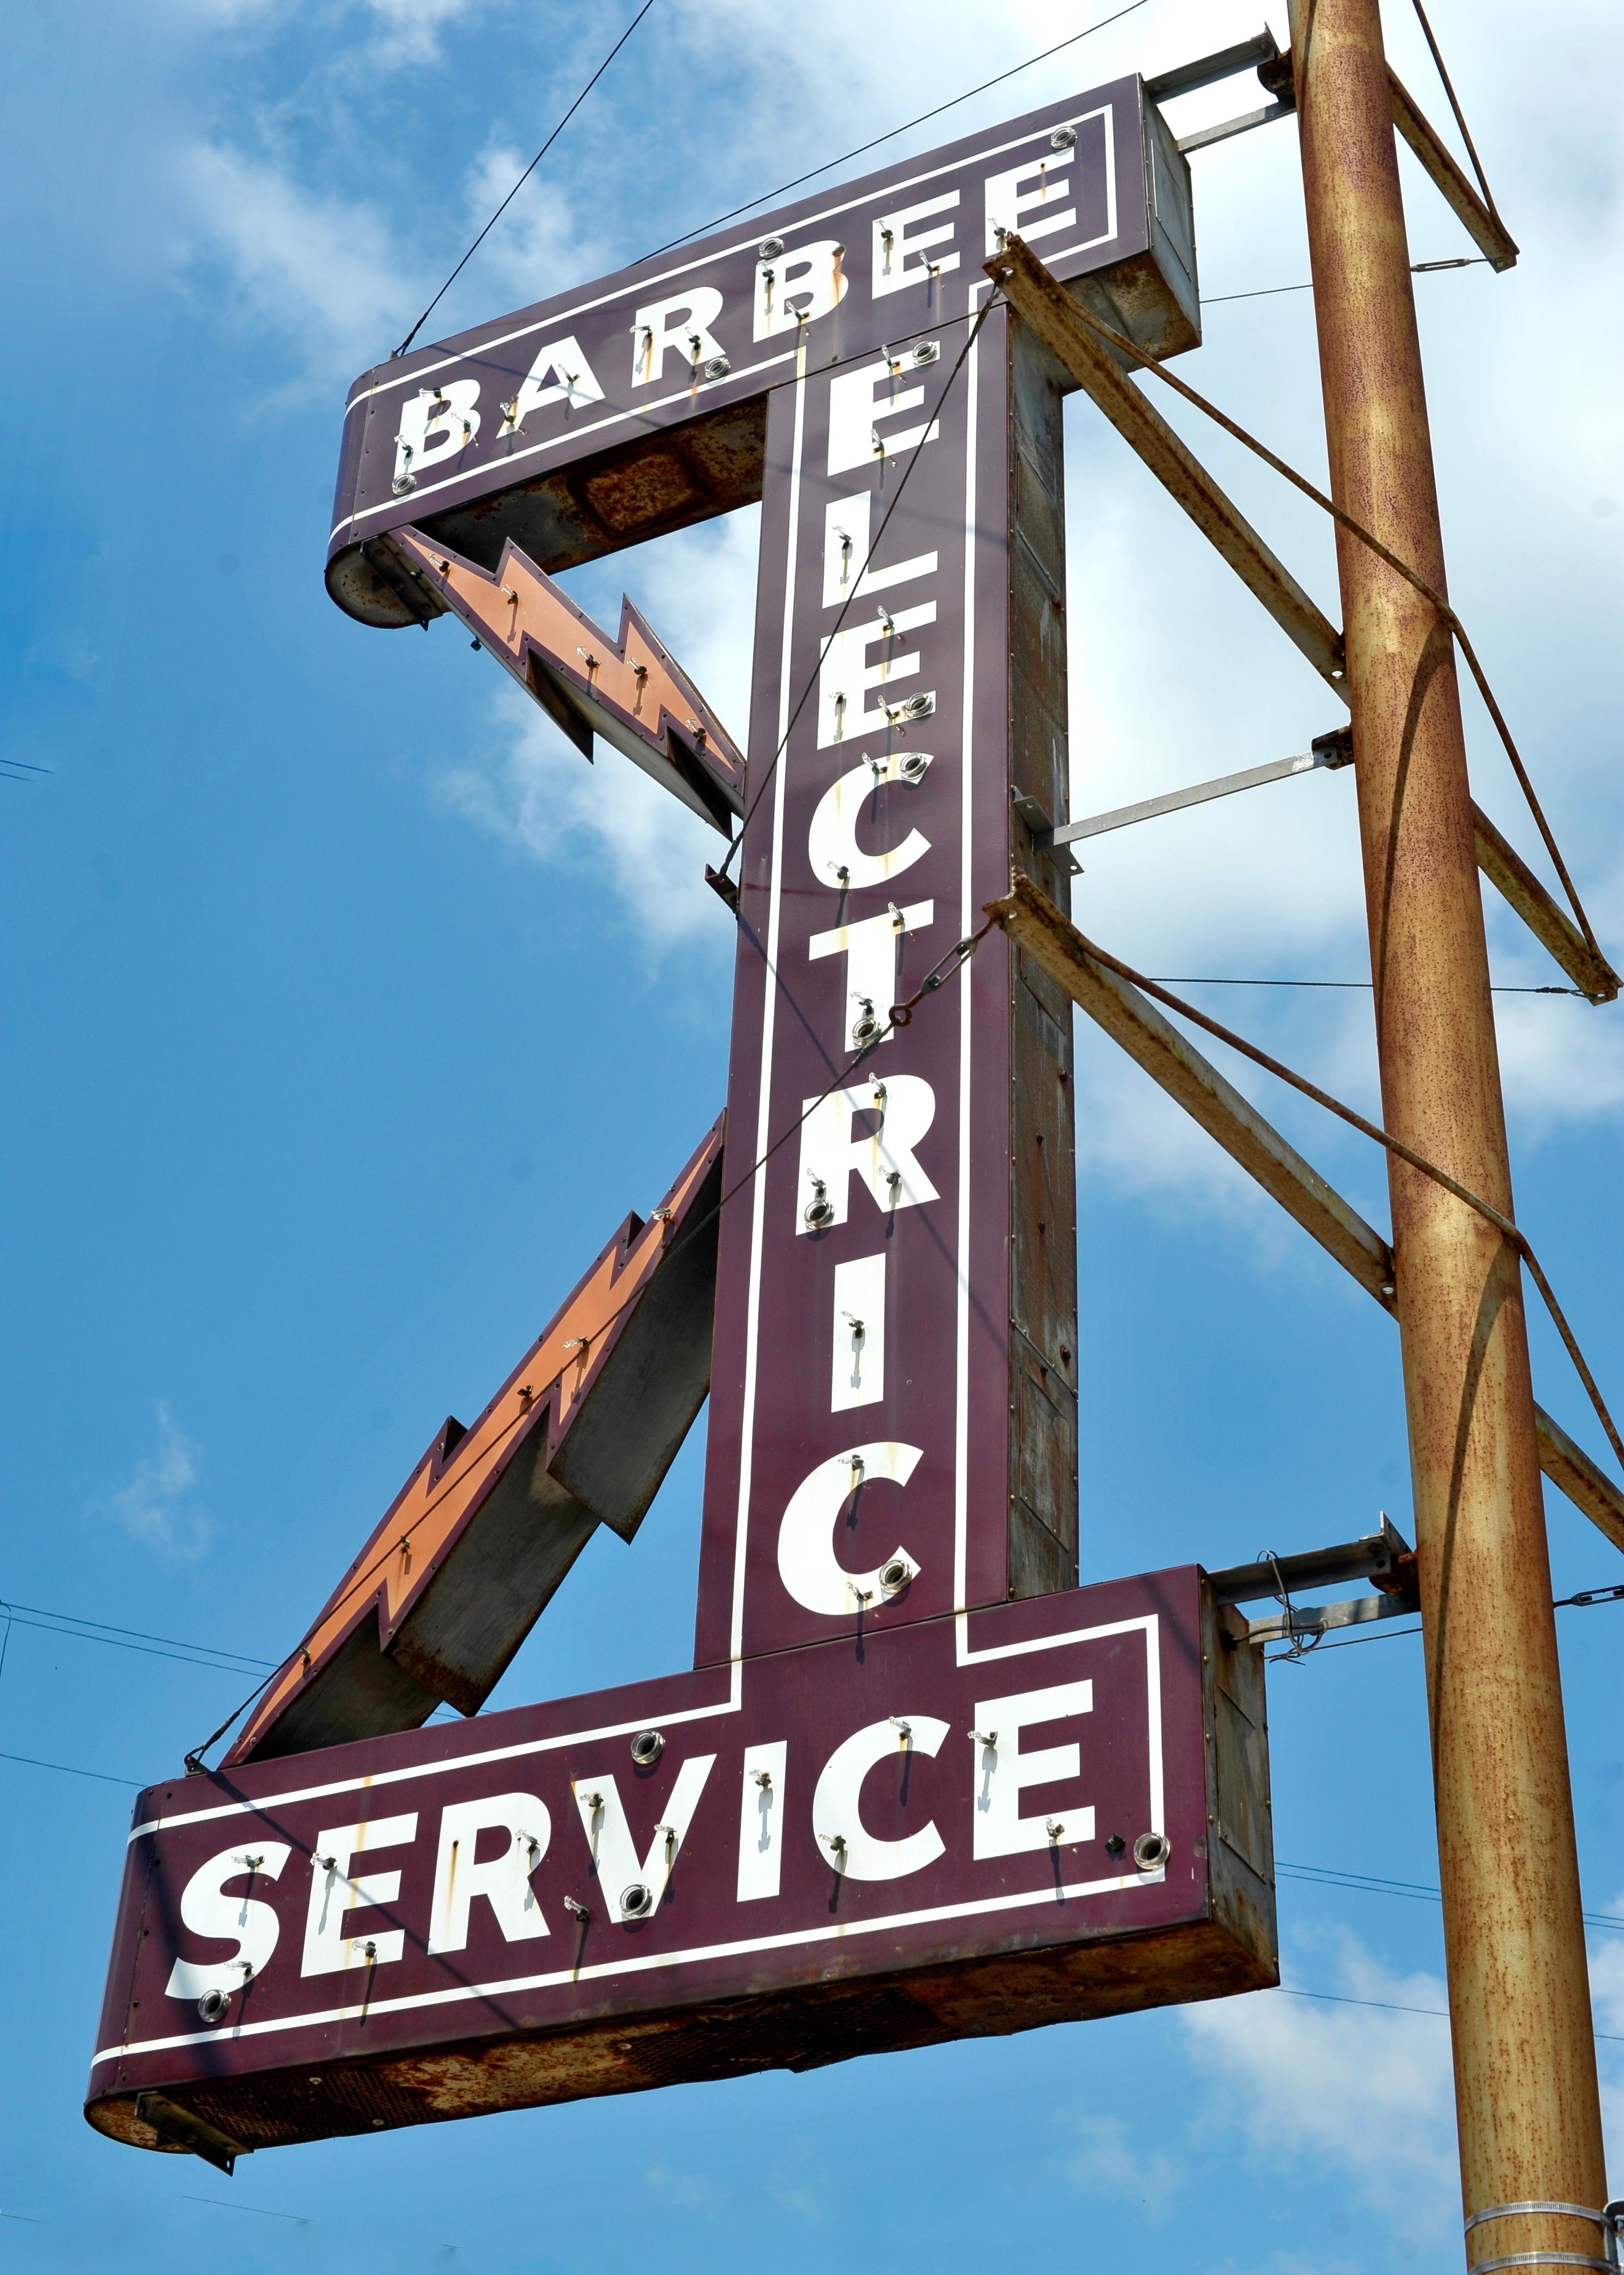 Barbee Electric Service - 401 East Caney Street, Wharton, Texas U.S.A. - September 2, 2016